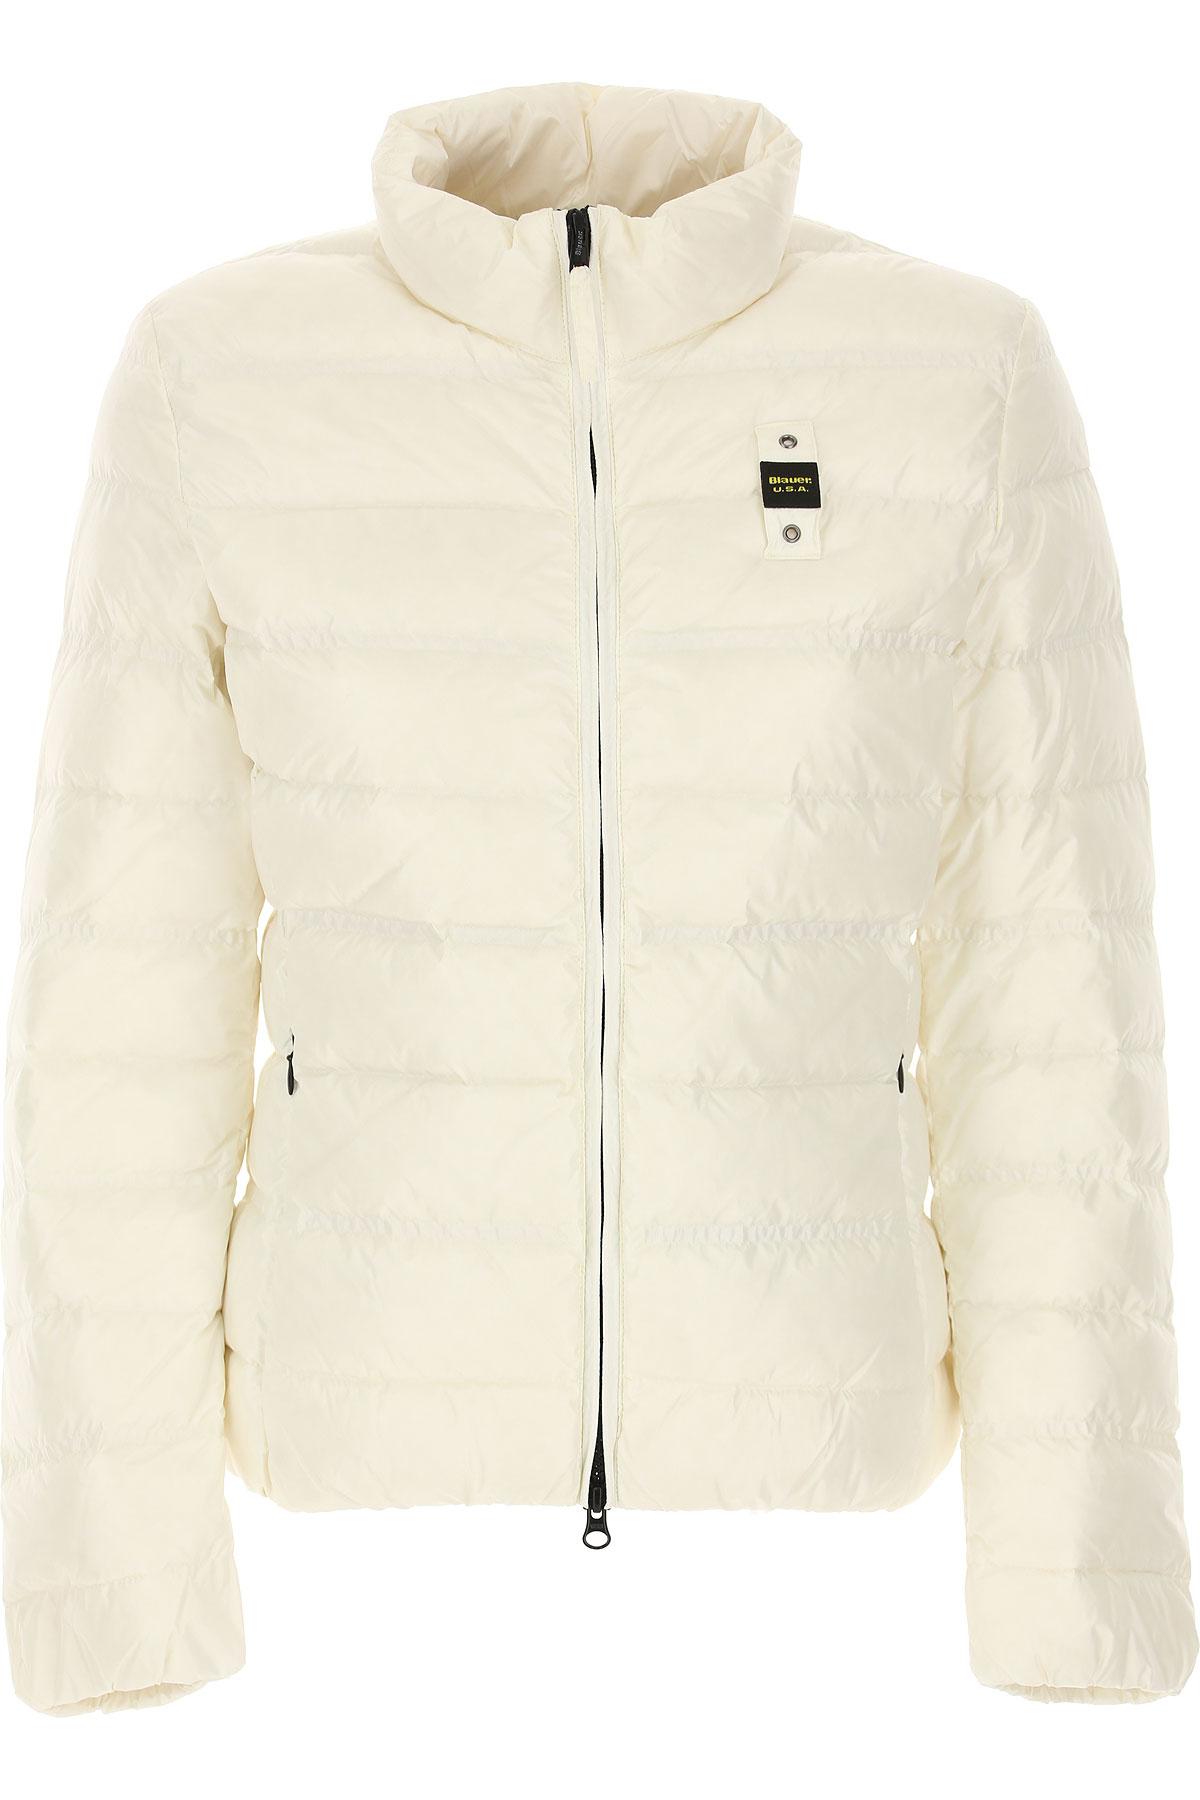 Blauer Down Jacket for Women, Puffer Ski Jacket On Sale, White, polyester, 2019, 4 6 8